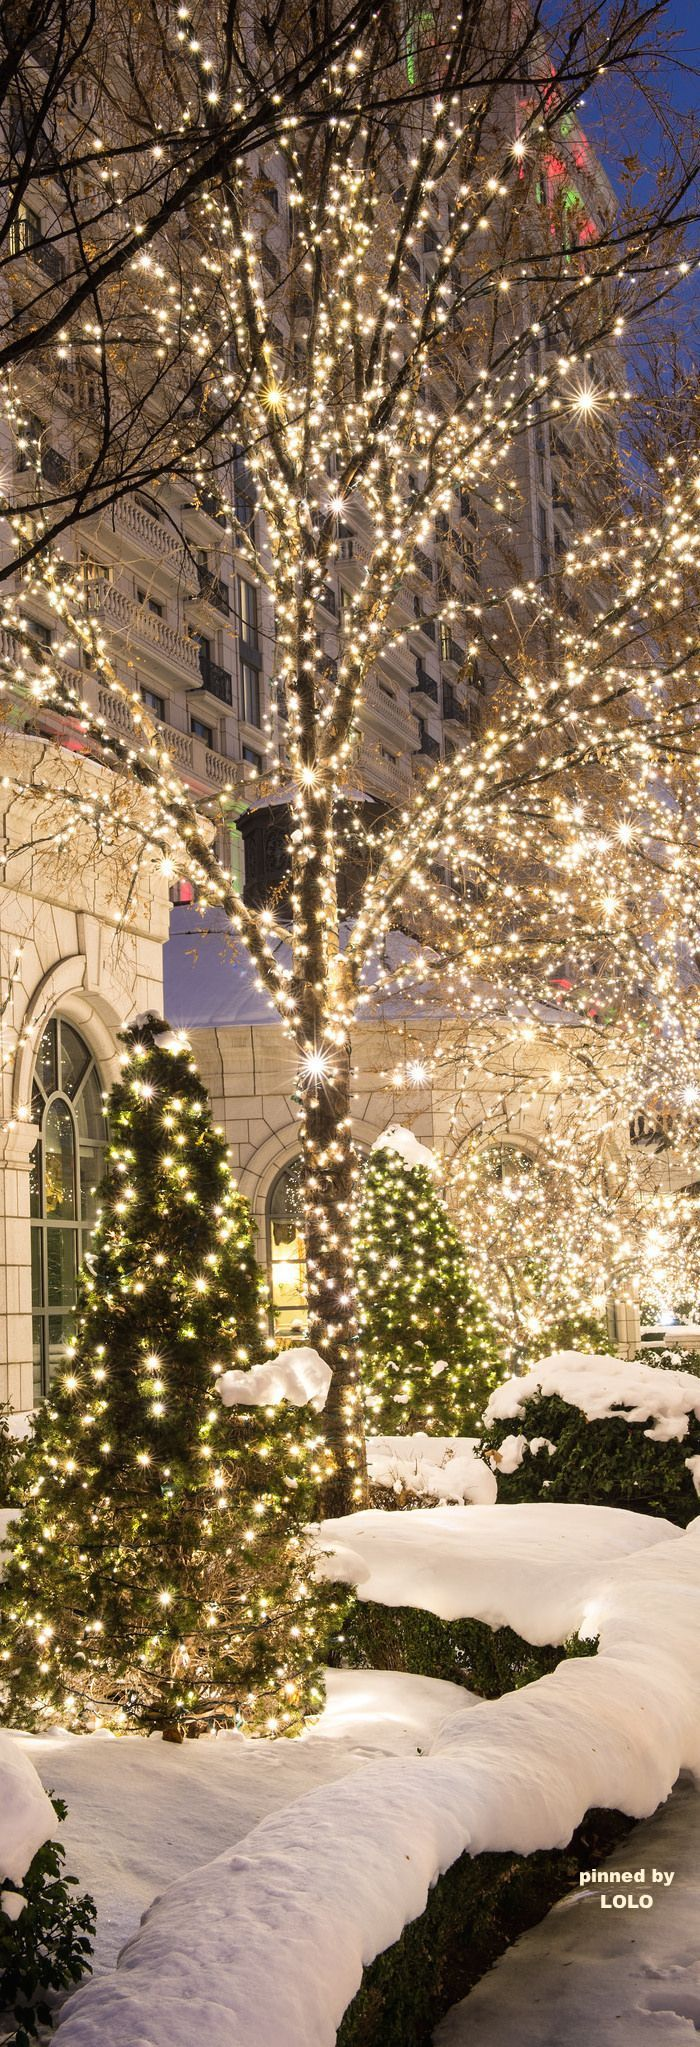 The Millionairess Of Pennsylvania: Christmas Lites via Flickr